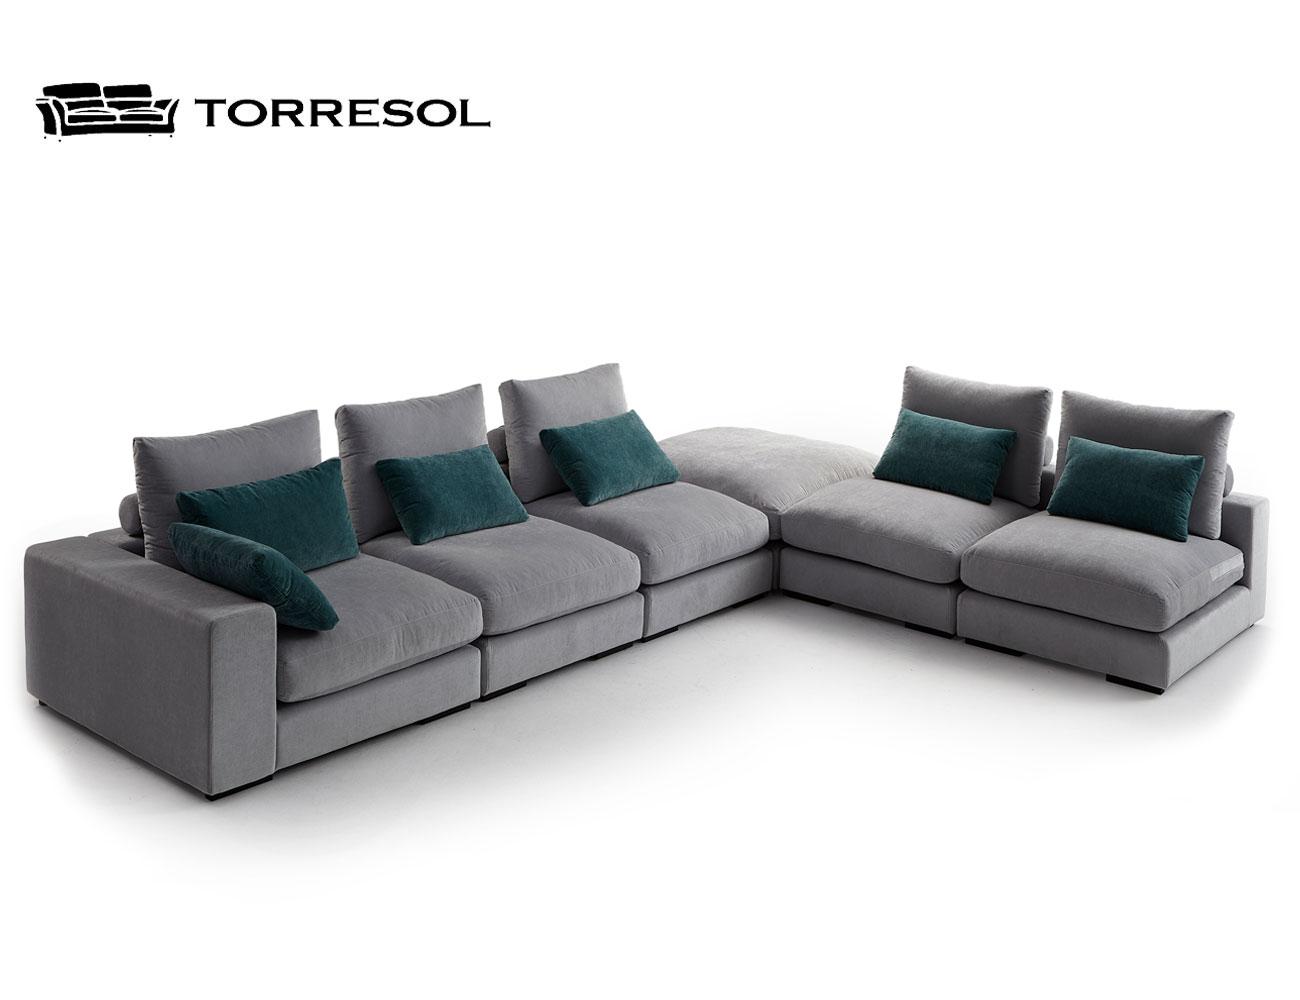 Sofa conil torresol